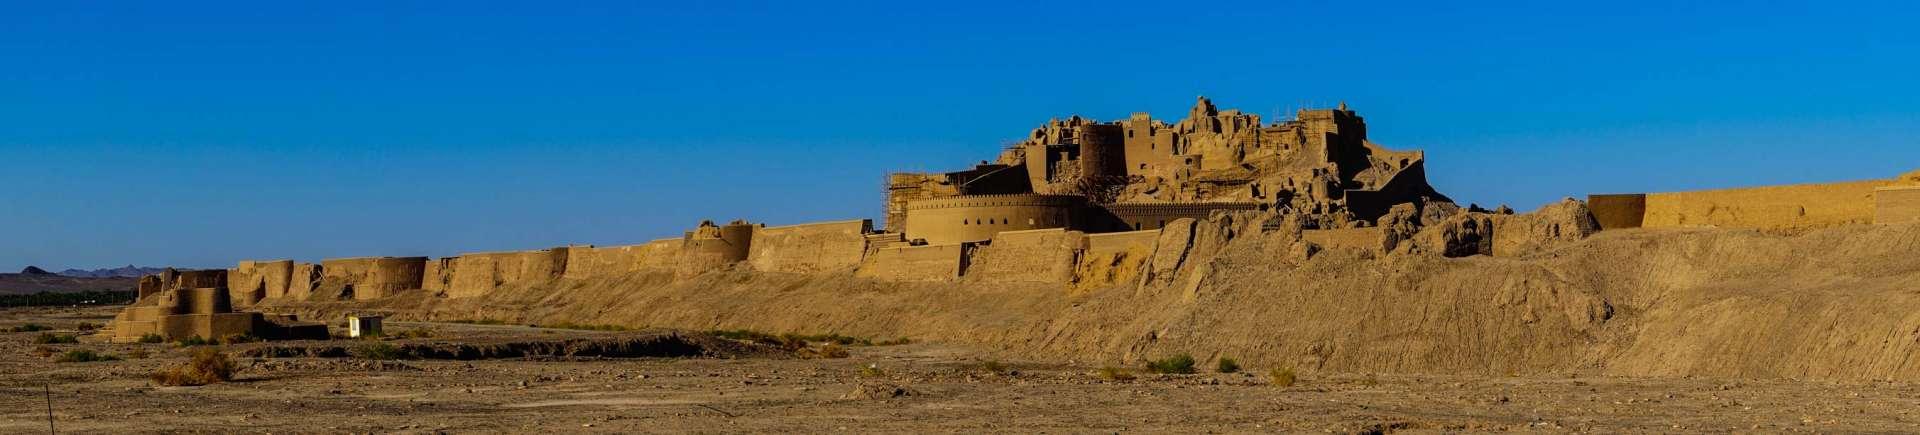 Bam citadel 5